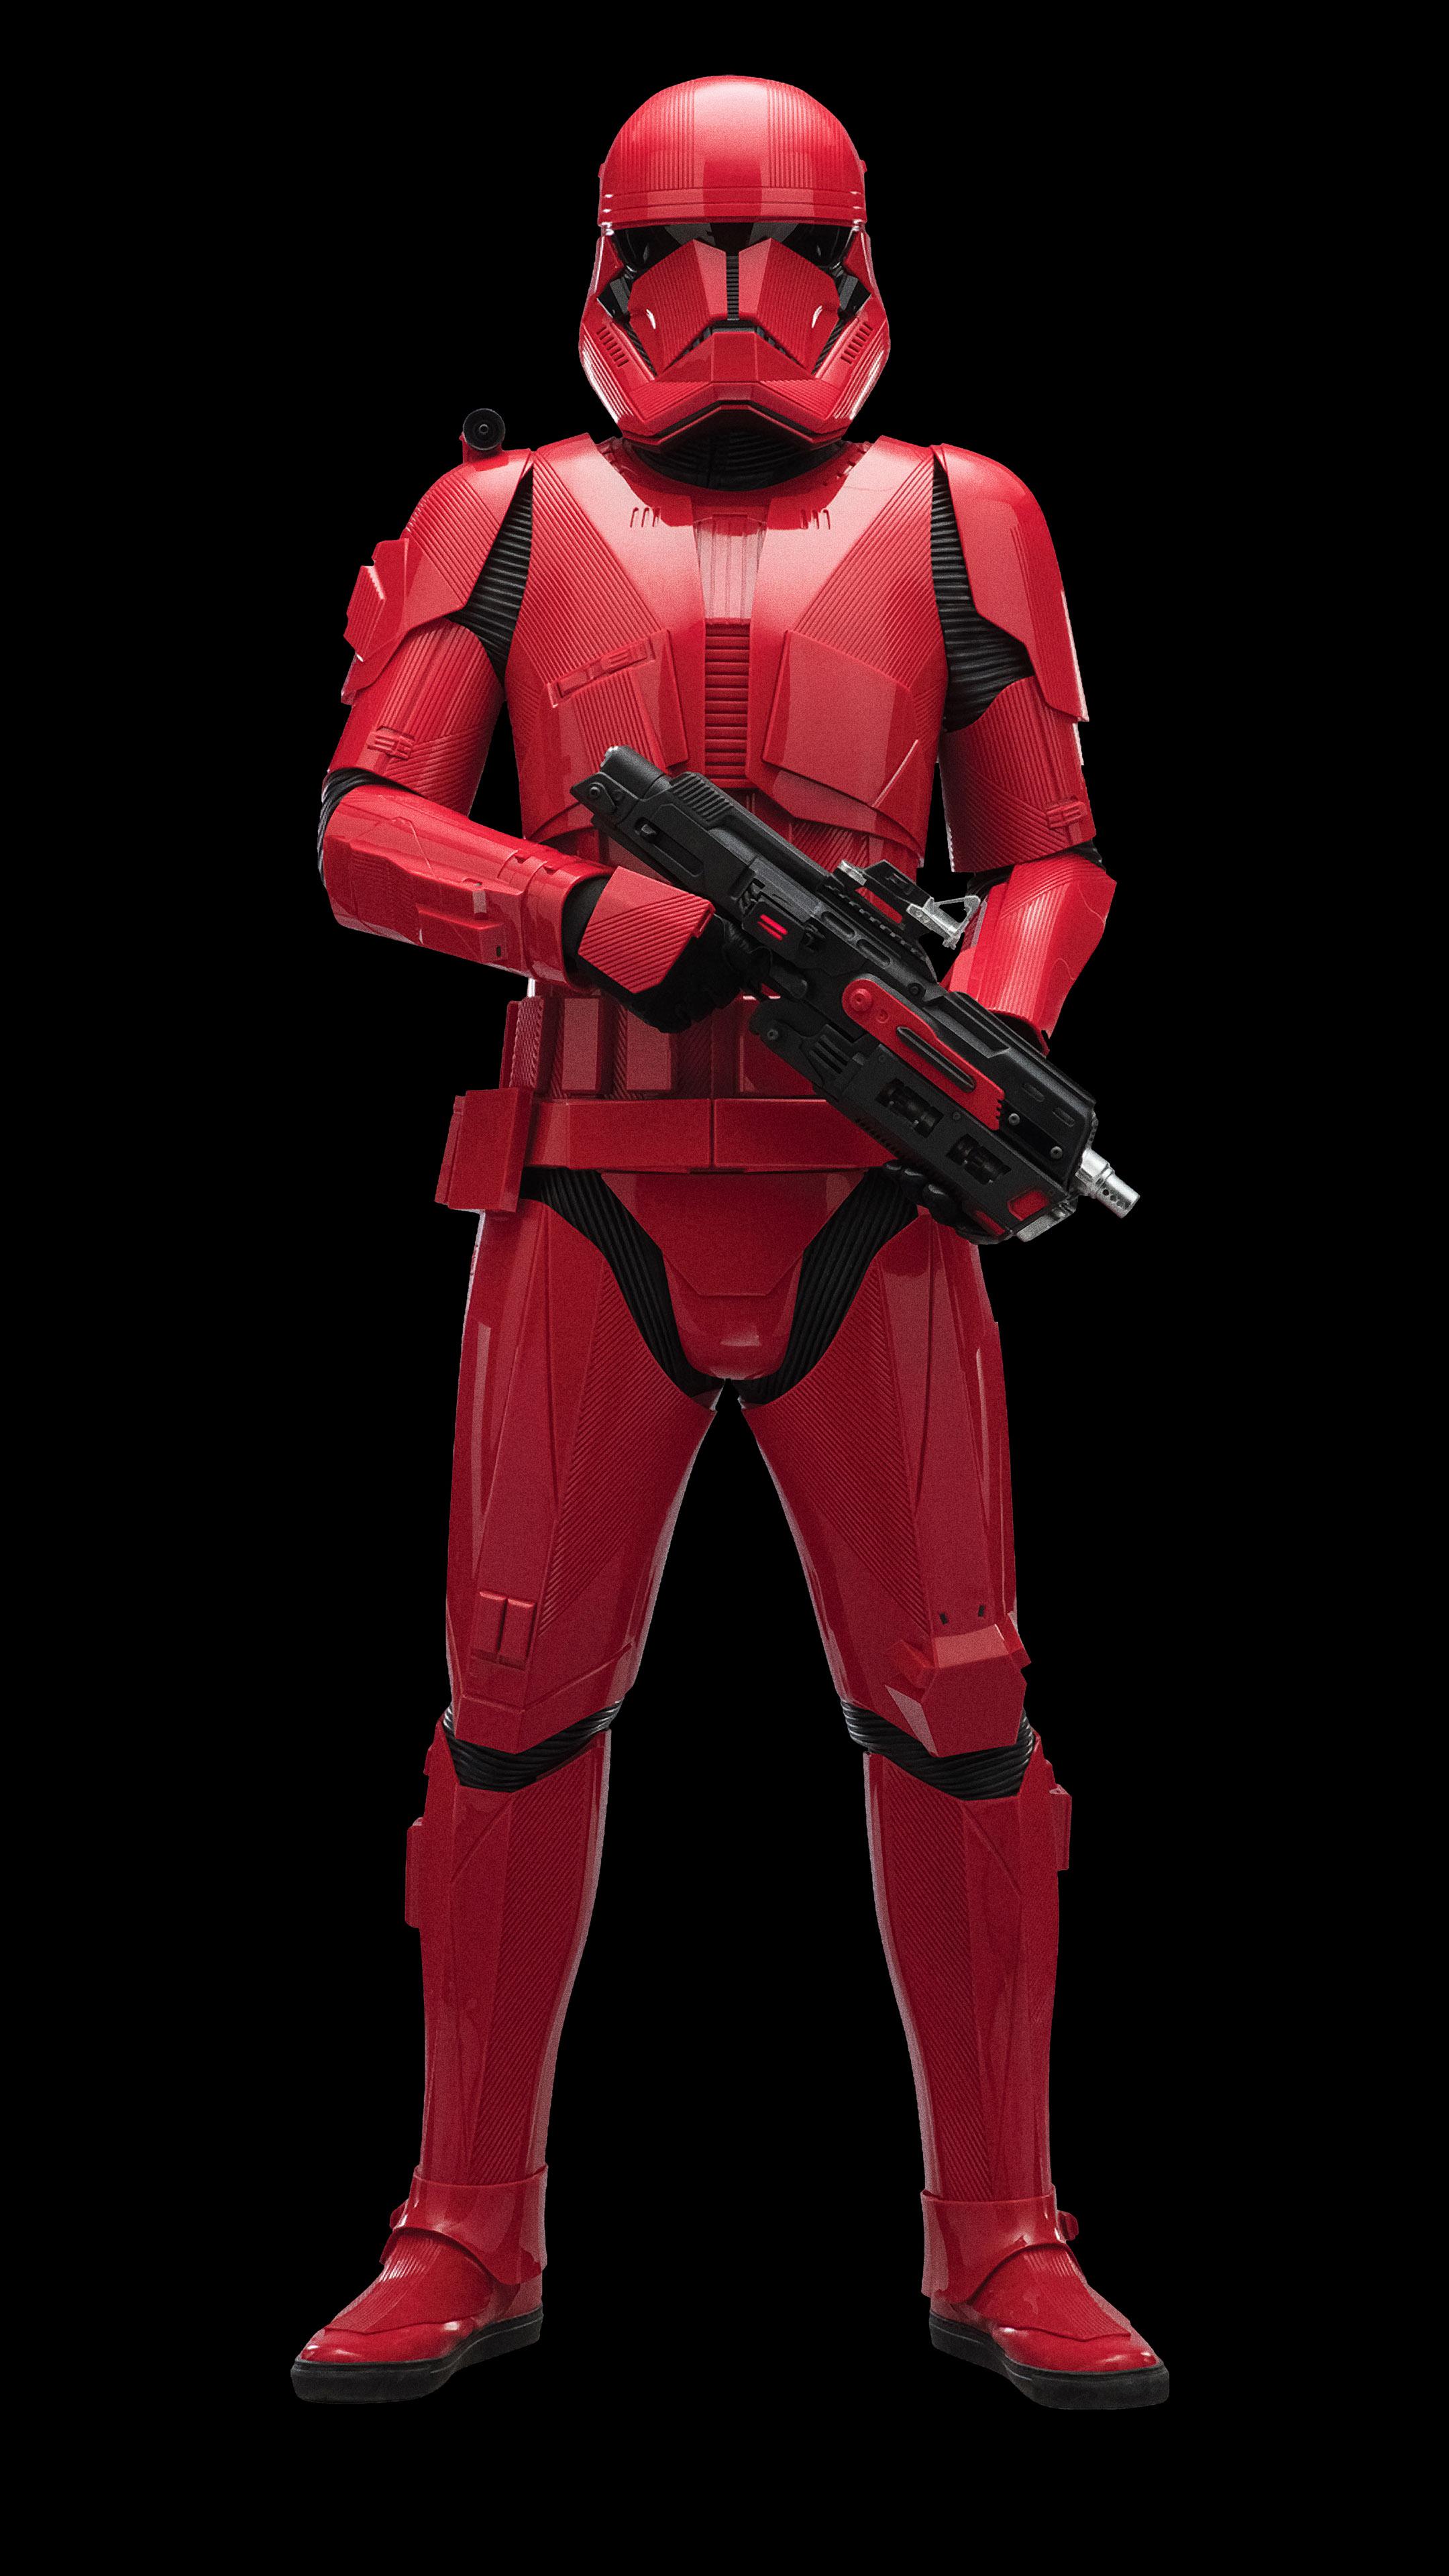 Sith Trooper Star Wars The Rise Of Skywalker 2019 4k Ultra Hd Mobile Wallpaper